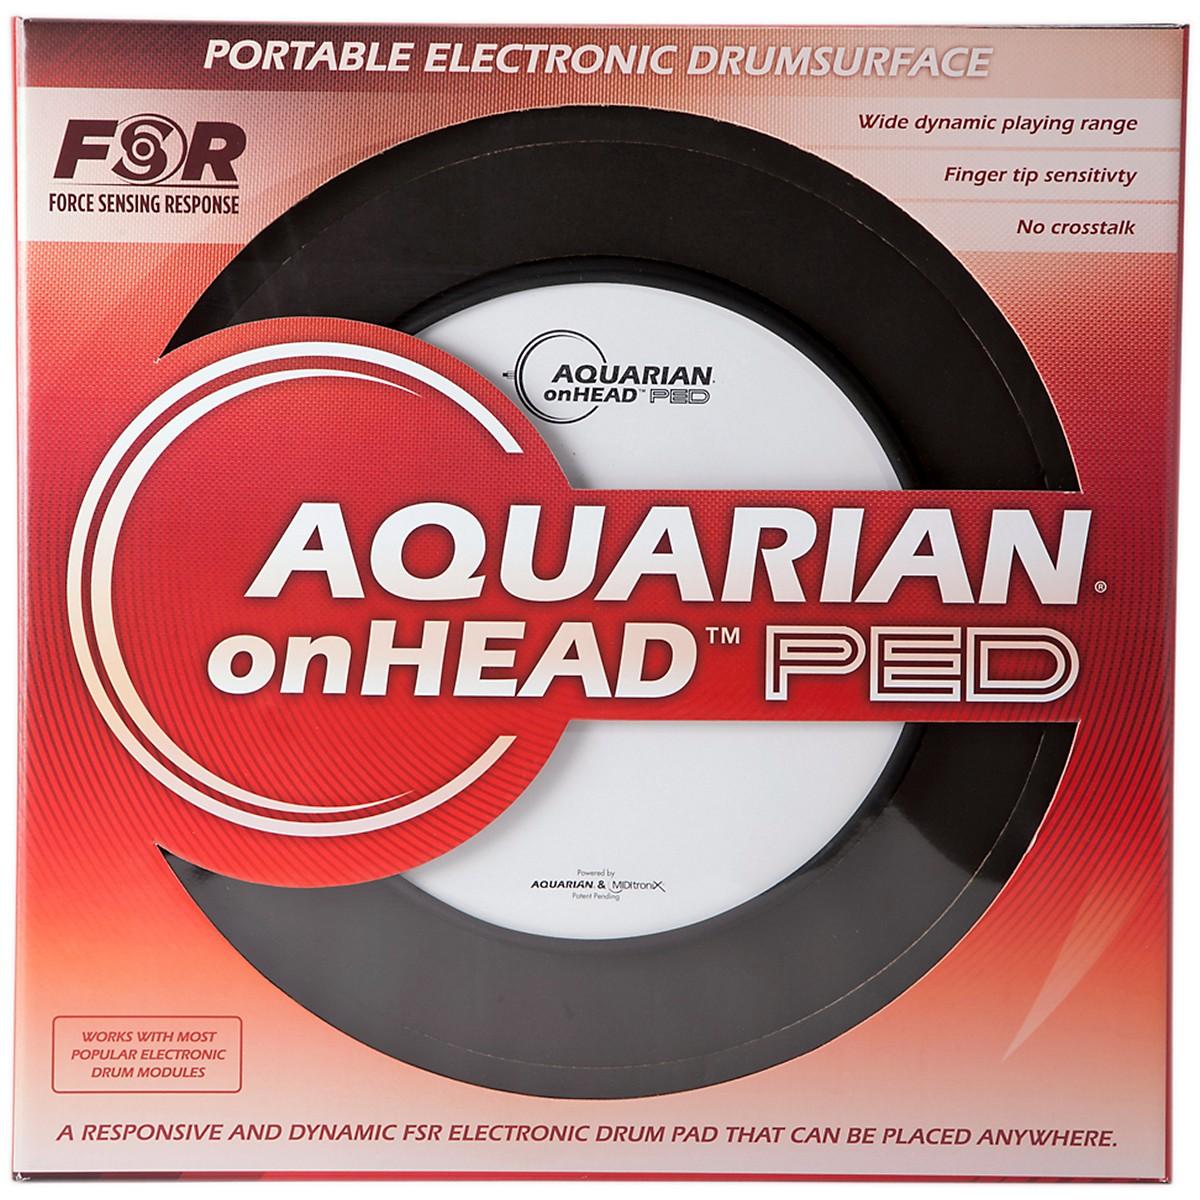 Aquarian onHEAD Portable Electronic Drumsurface Bundle Pak